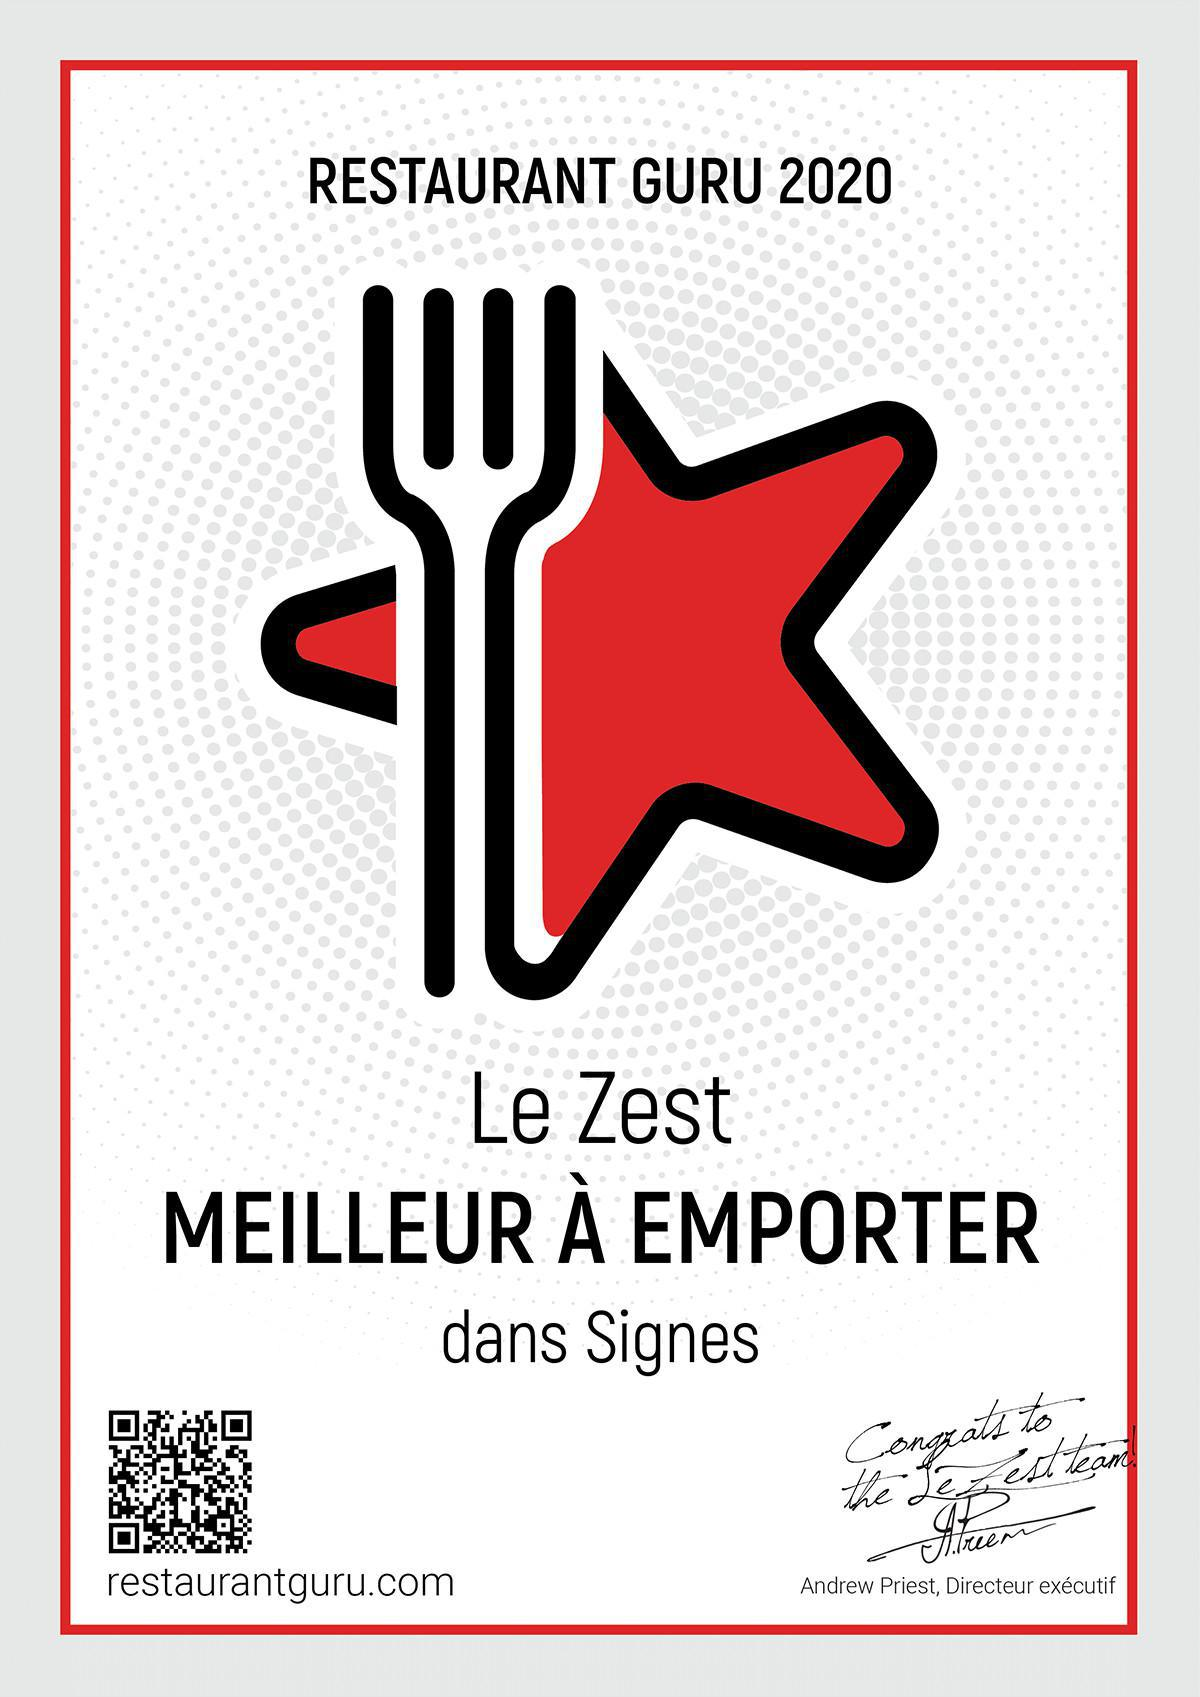 Restaurant GURU 2020 Le Z'Est N°1 !